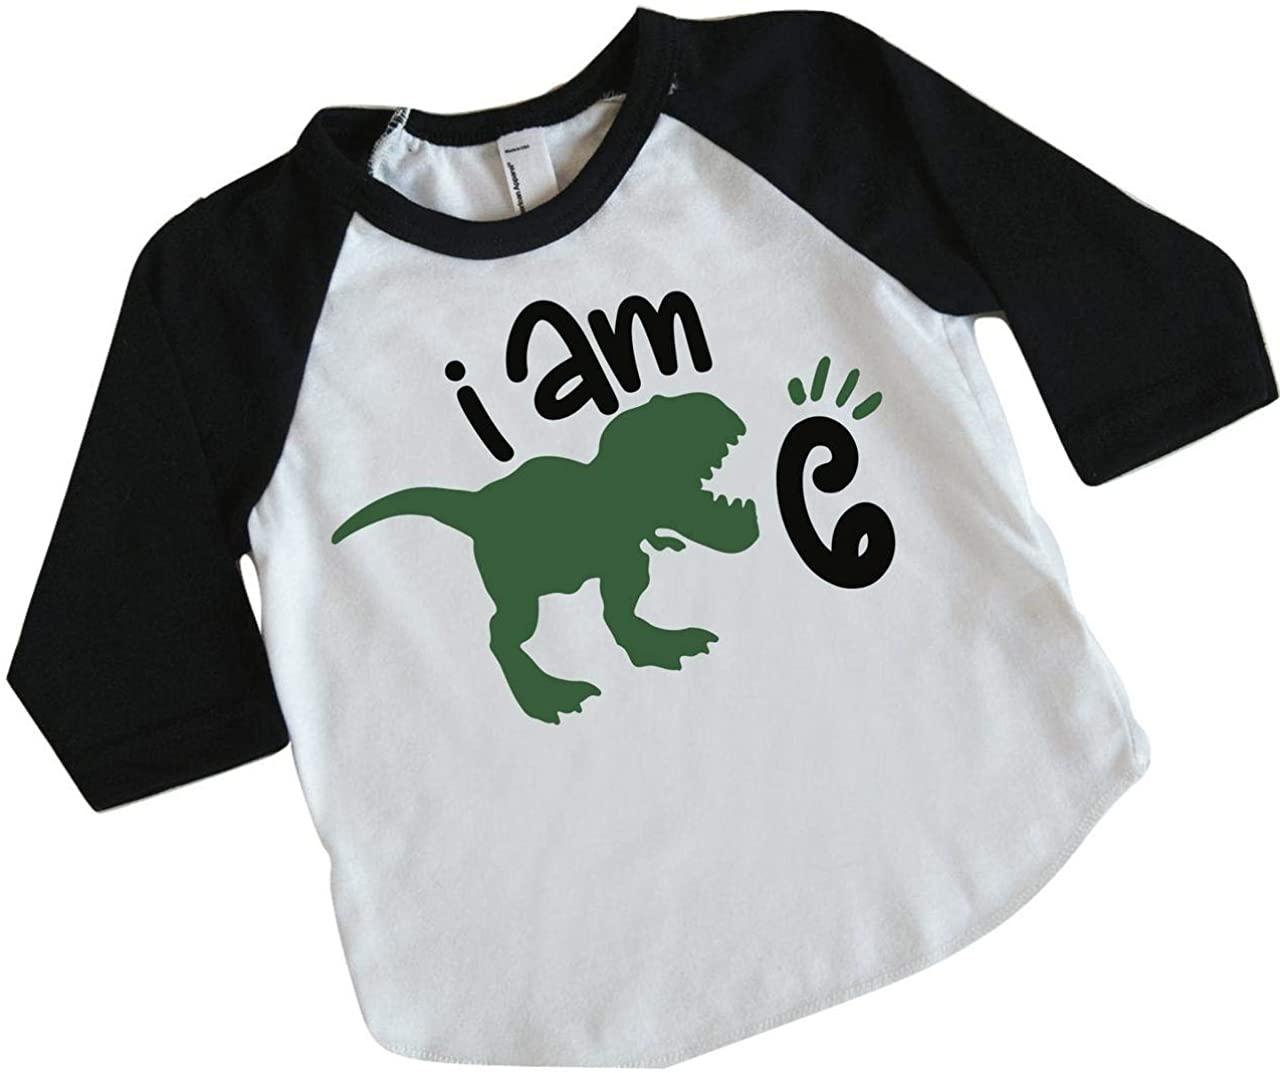 Six Birthday Dinosaur Shirt for Boys Sixth Birthday Dinosaur Outfit